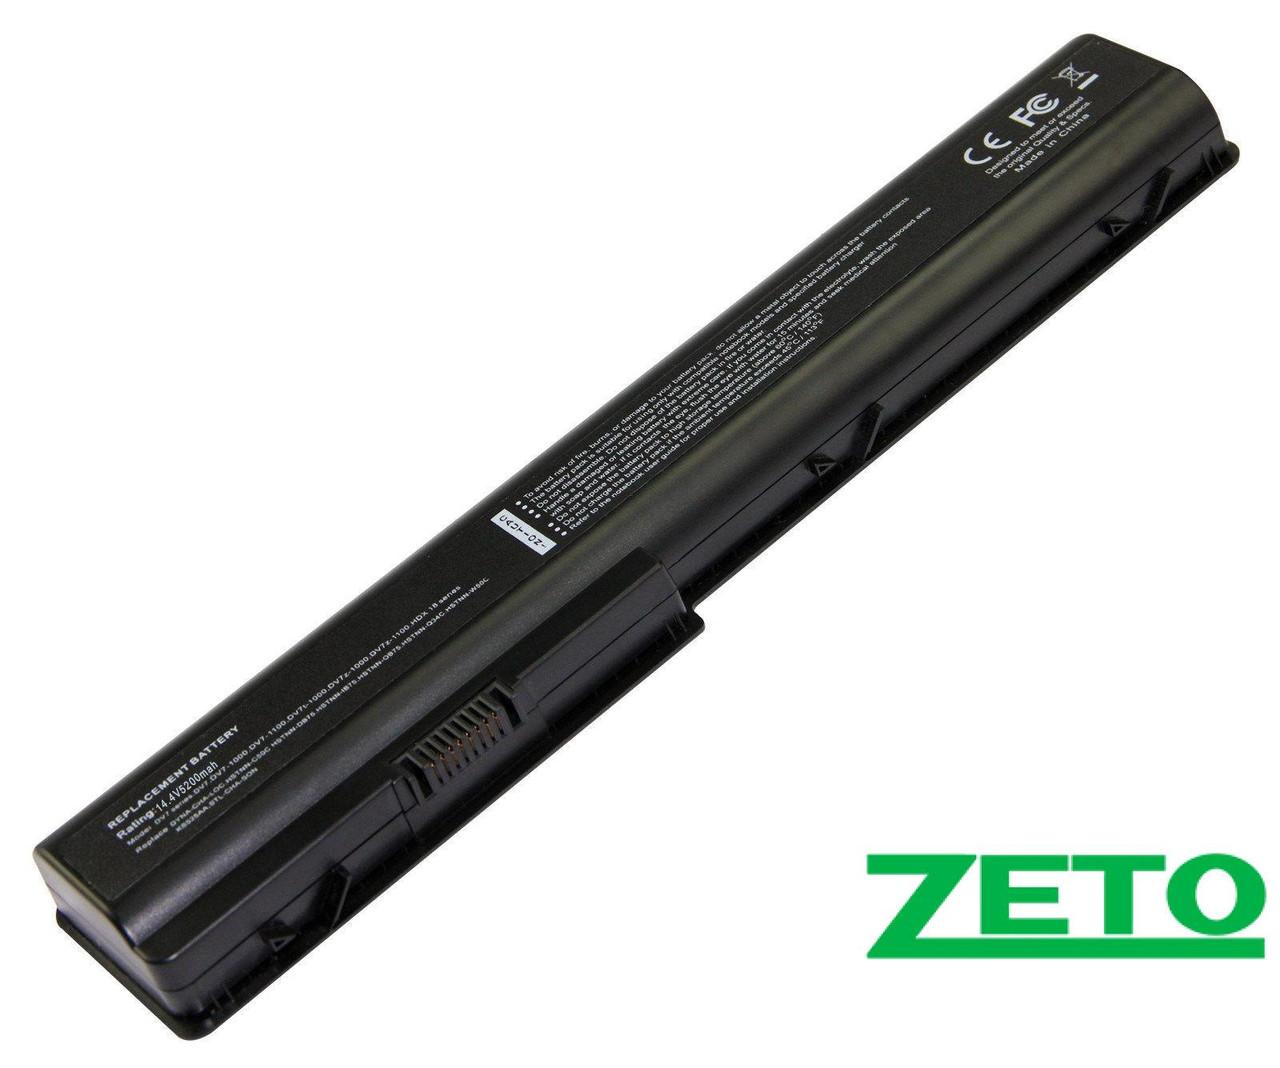 Батарея (аккумулятор) HP Pavilion dv7-3000 (14.4V 5200mAh)